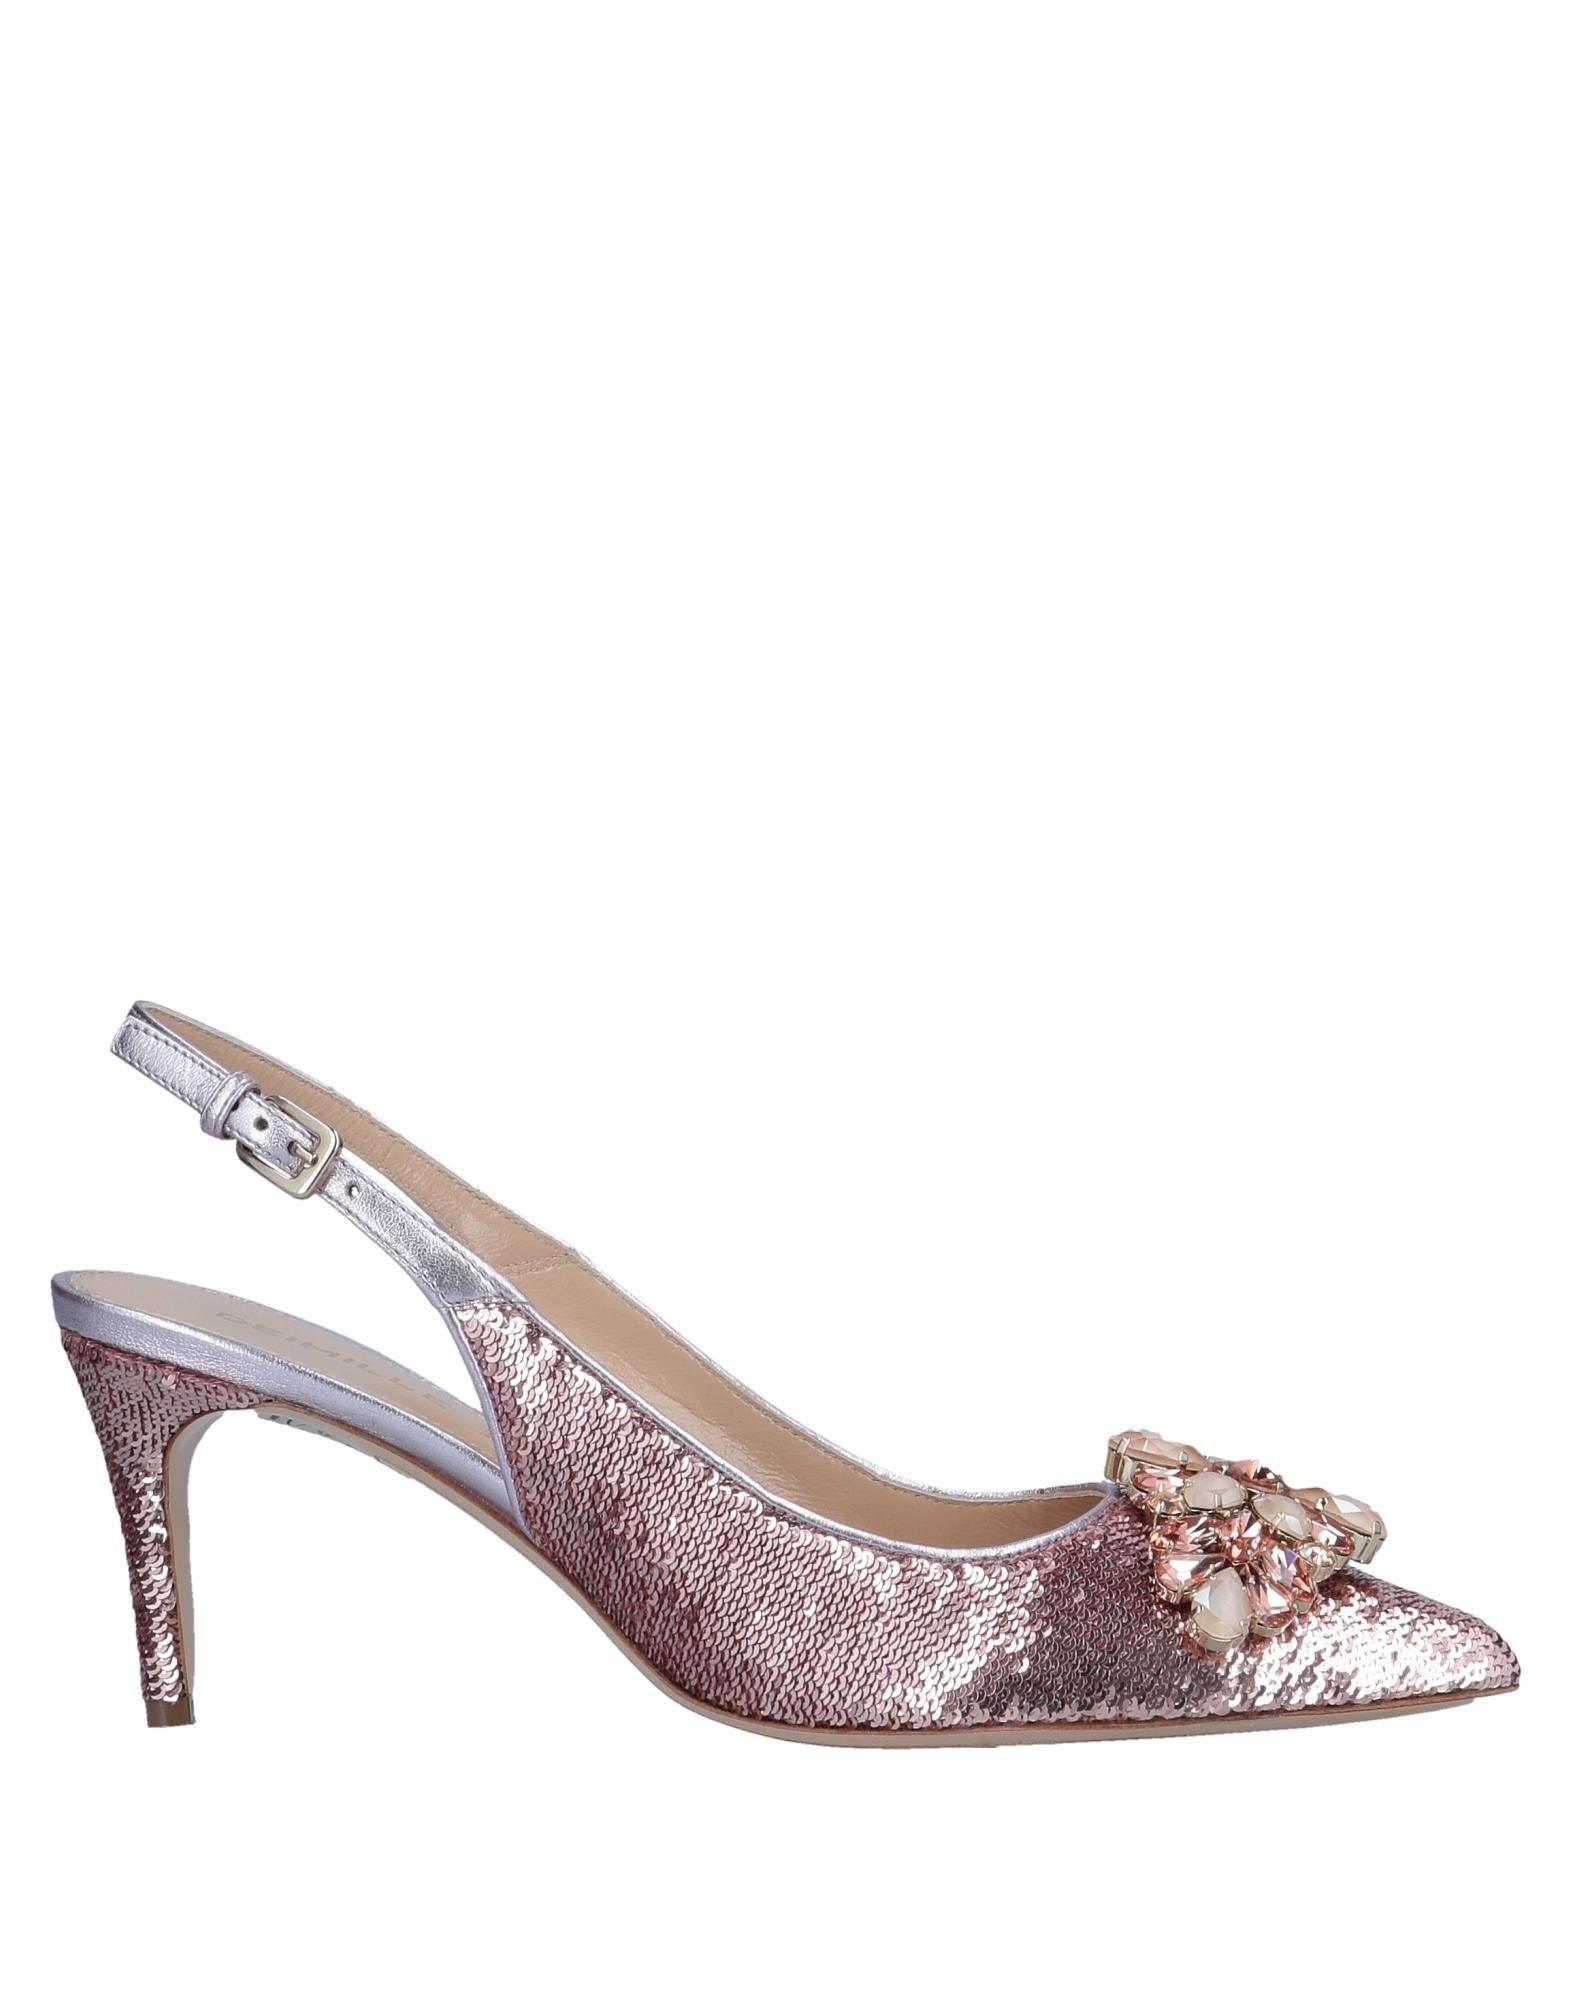 Stilvolle Damen billige Schuhe Deimille Pumps Damen Stilvolle  11556193FB 529d13